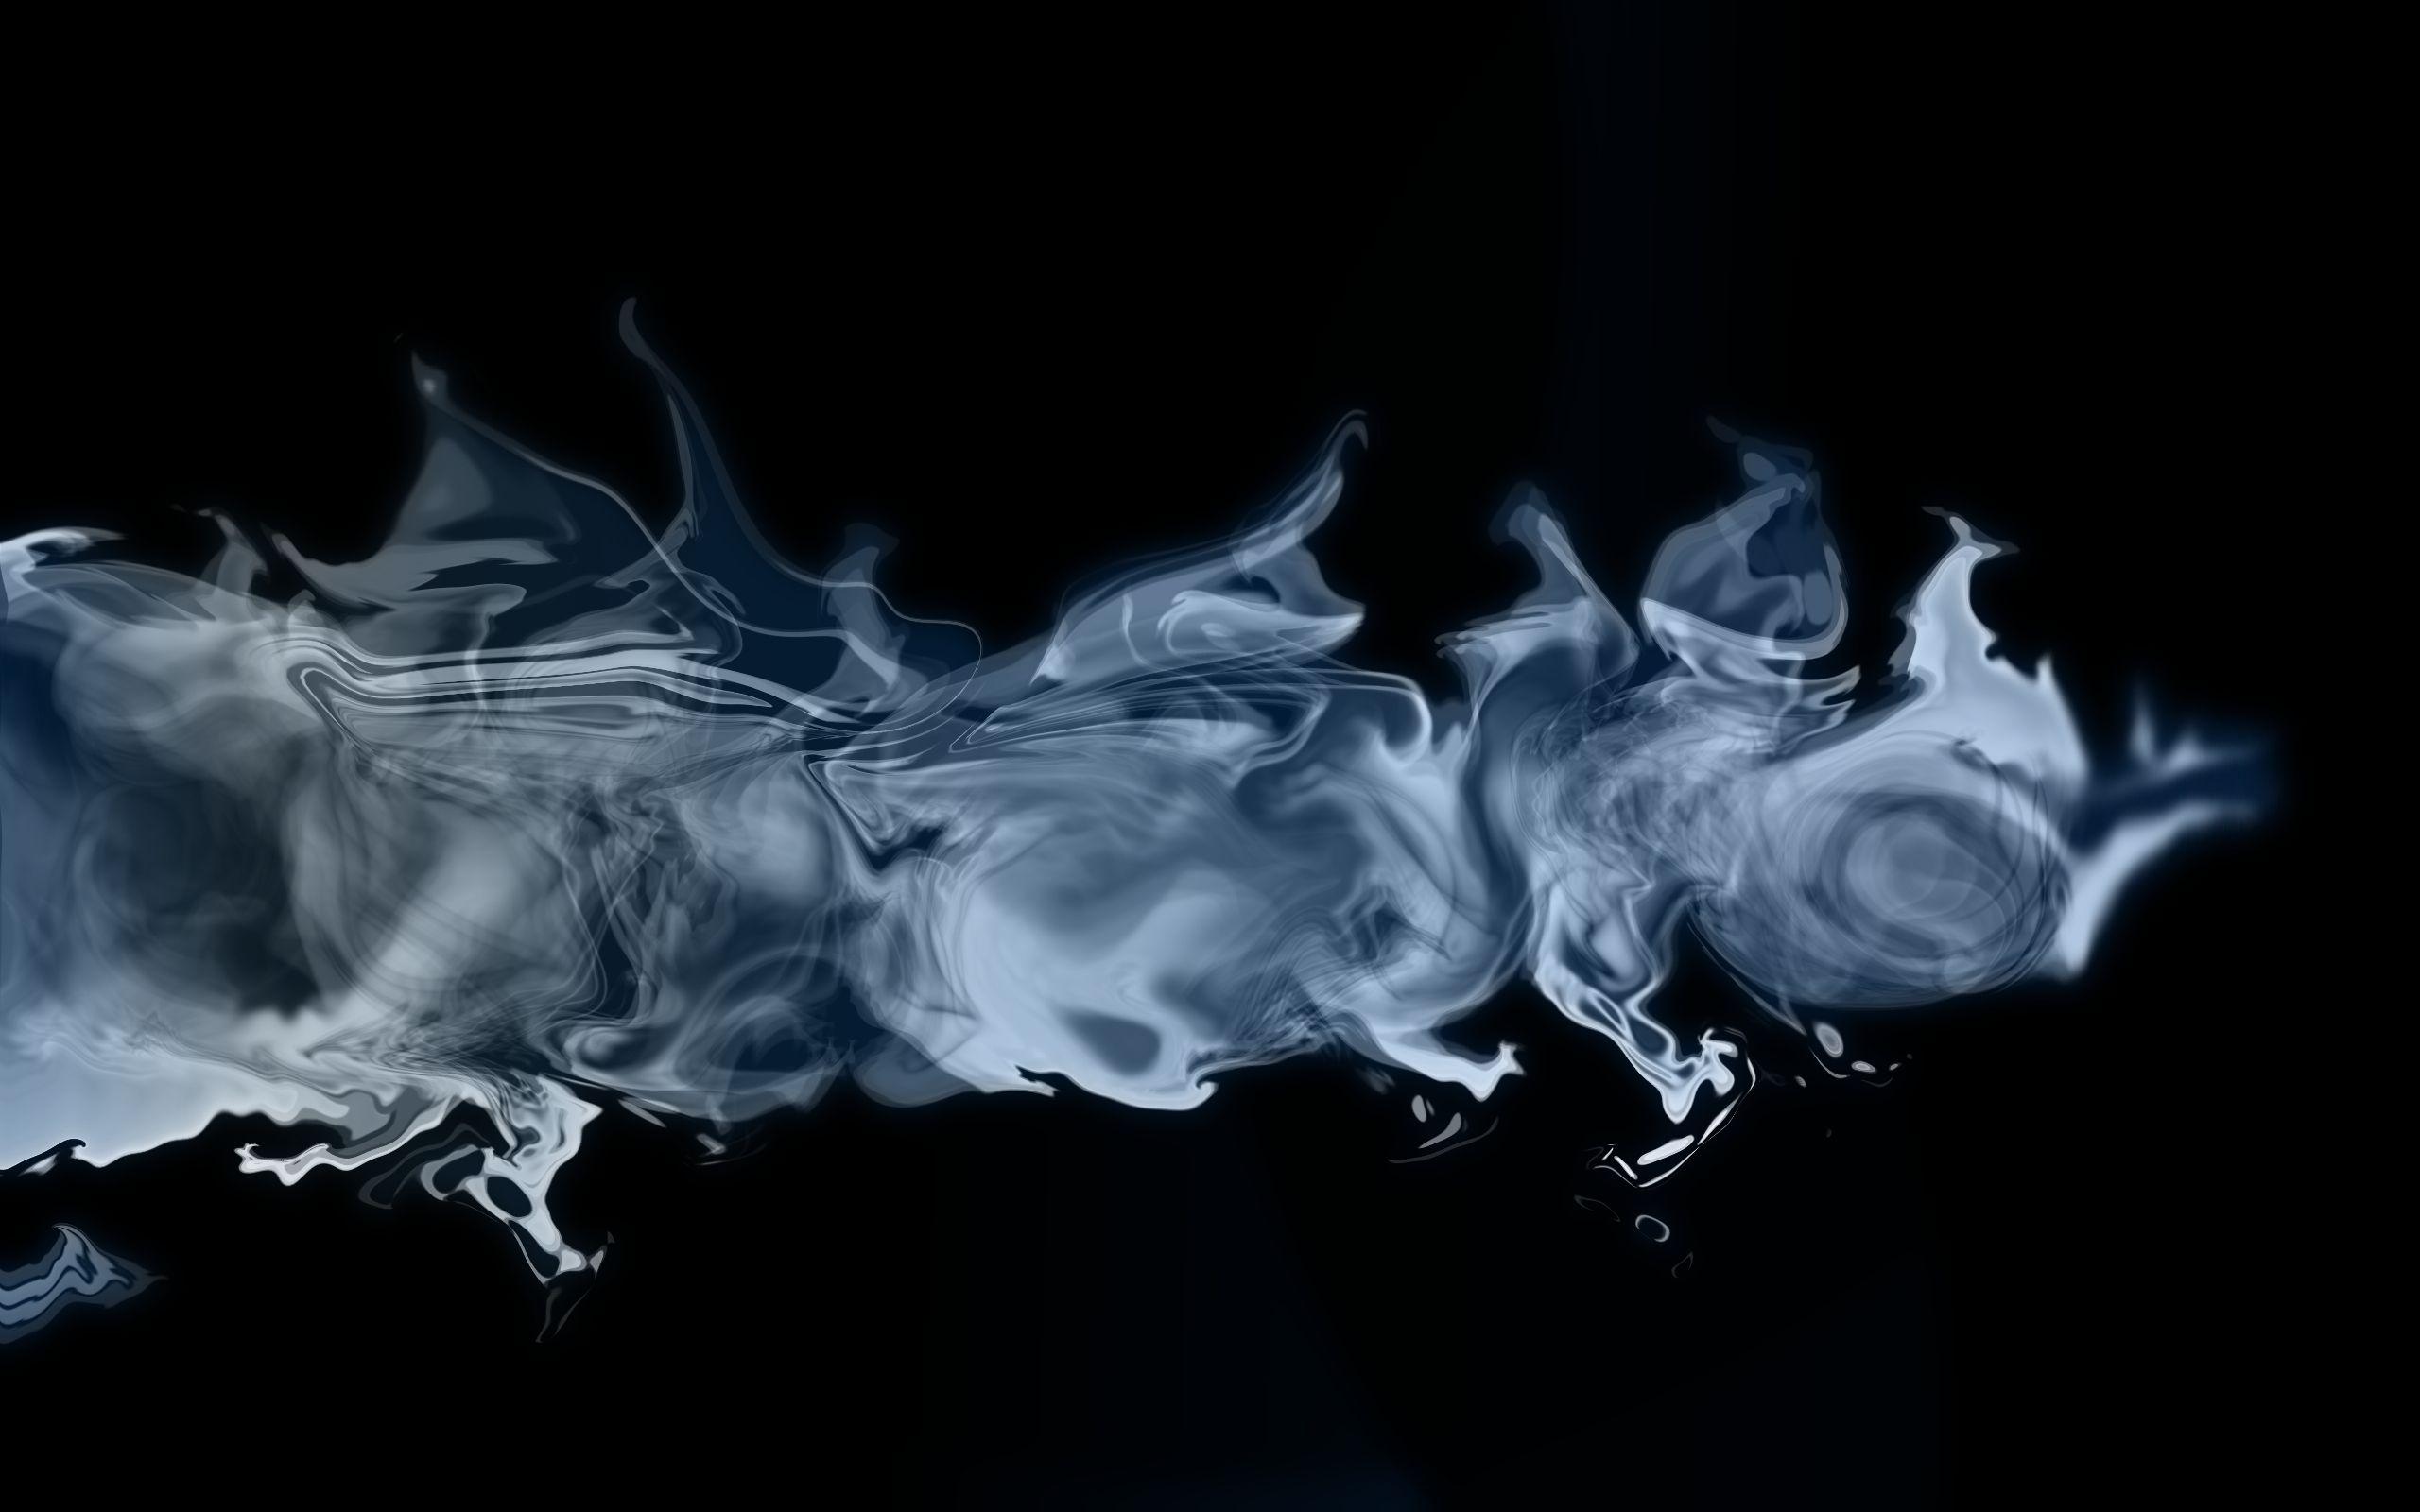 Amazing Smoke Photography Wallpaper HD Wallpaper | 3D ...